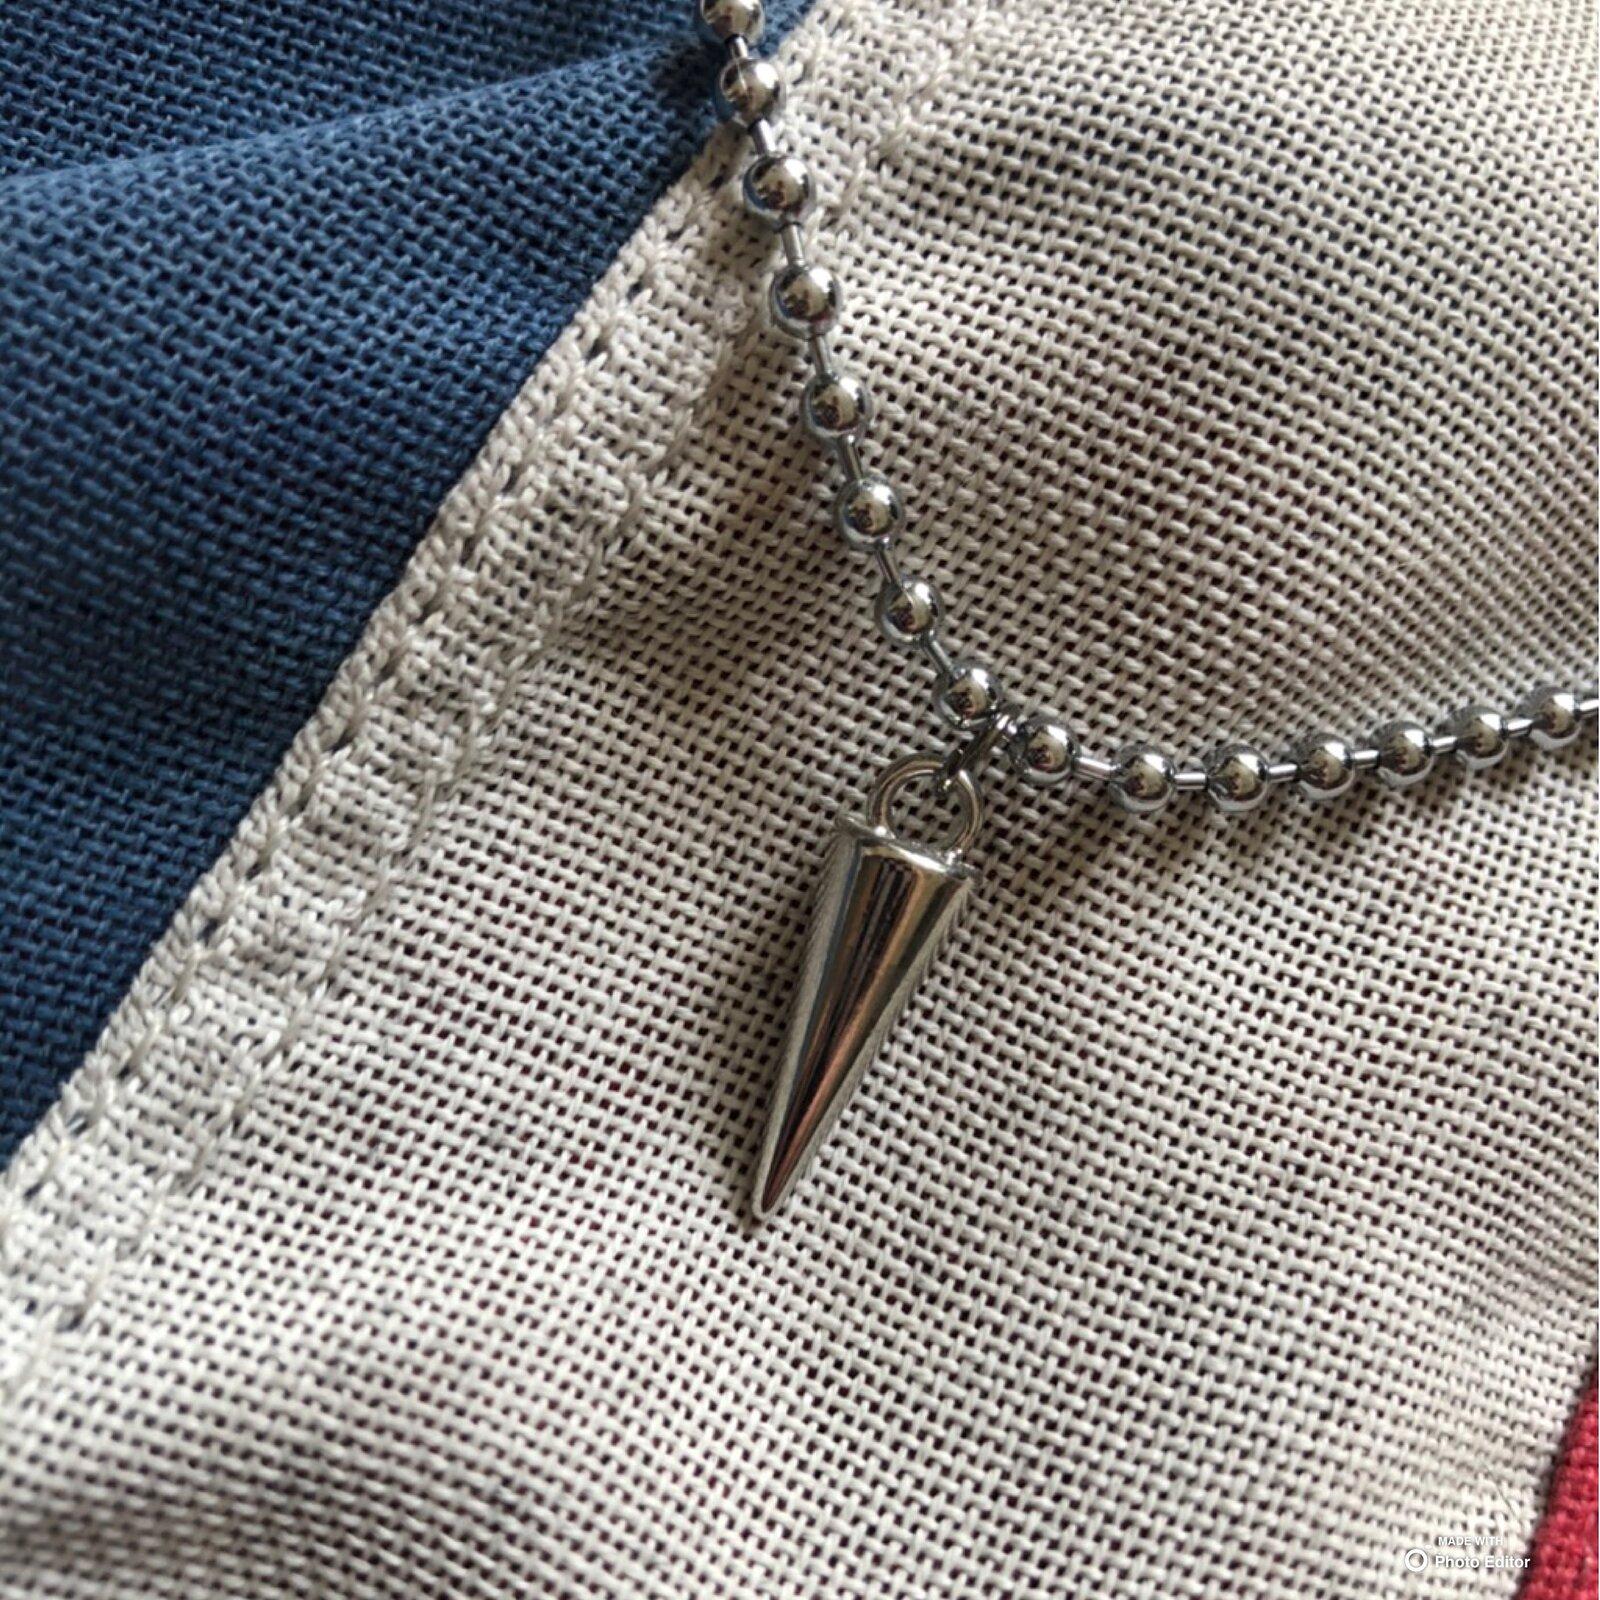 Spike pendant necklace